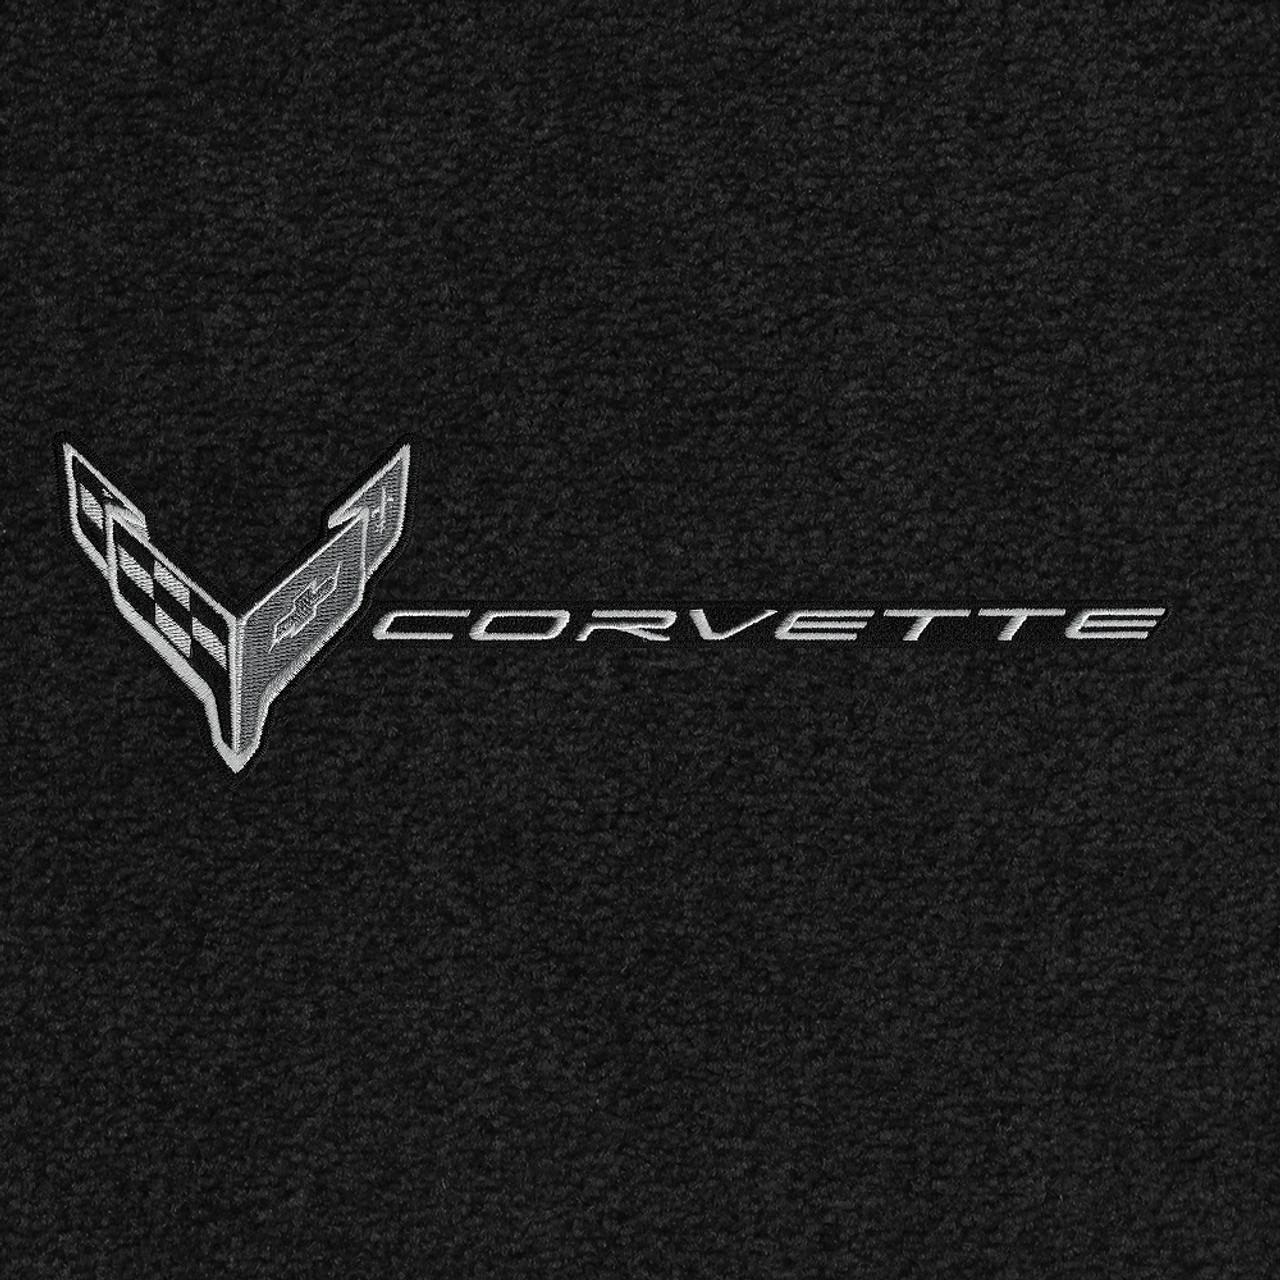 819406 - C8 Logo Monochromatic and Corvette Word Combo